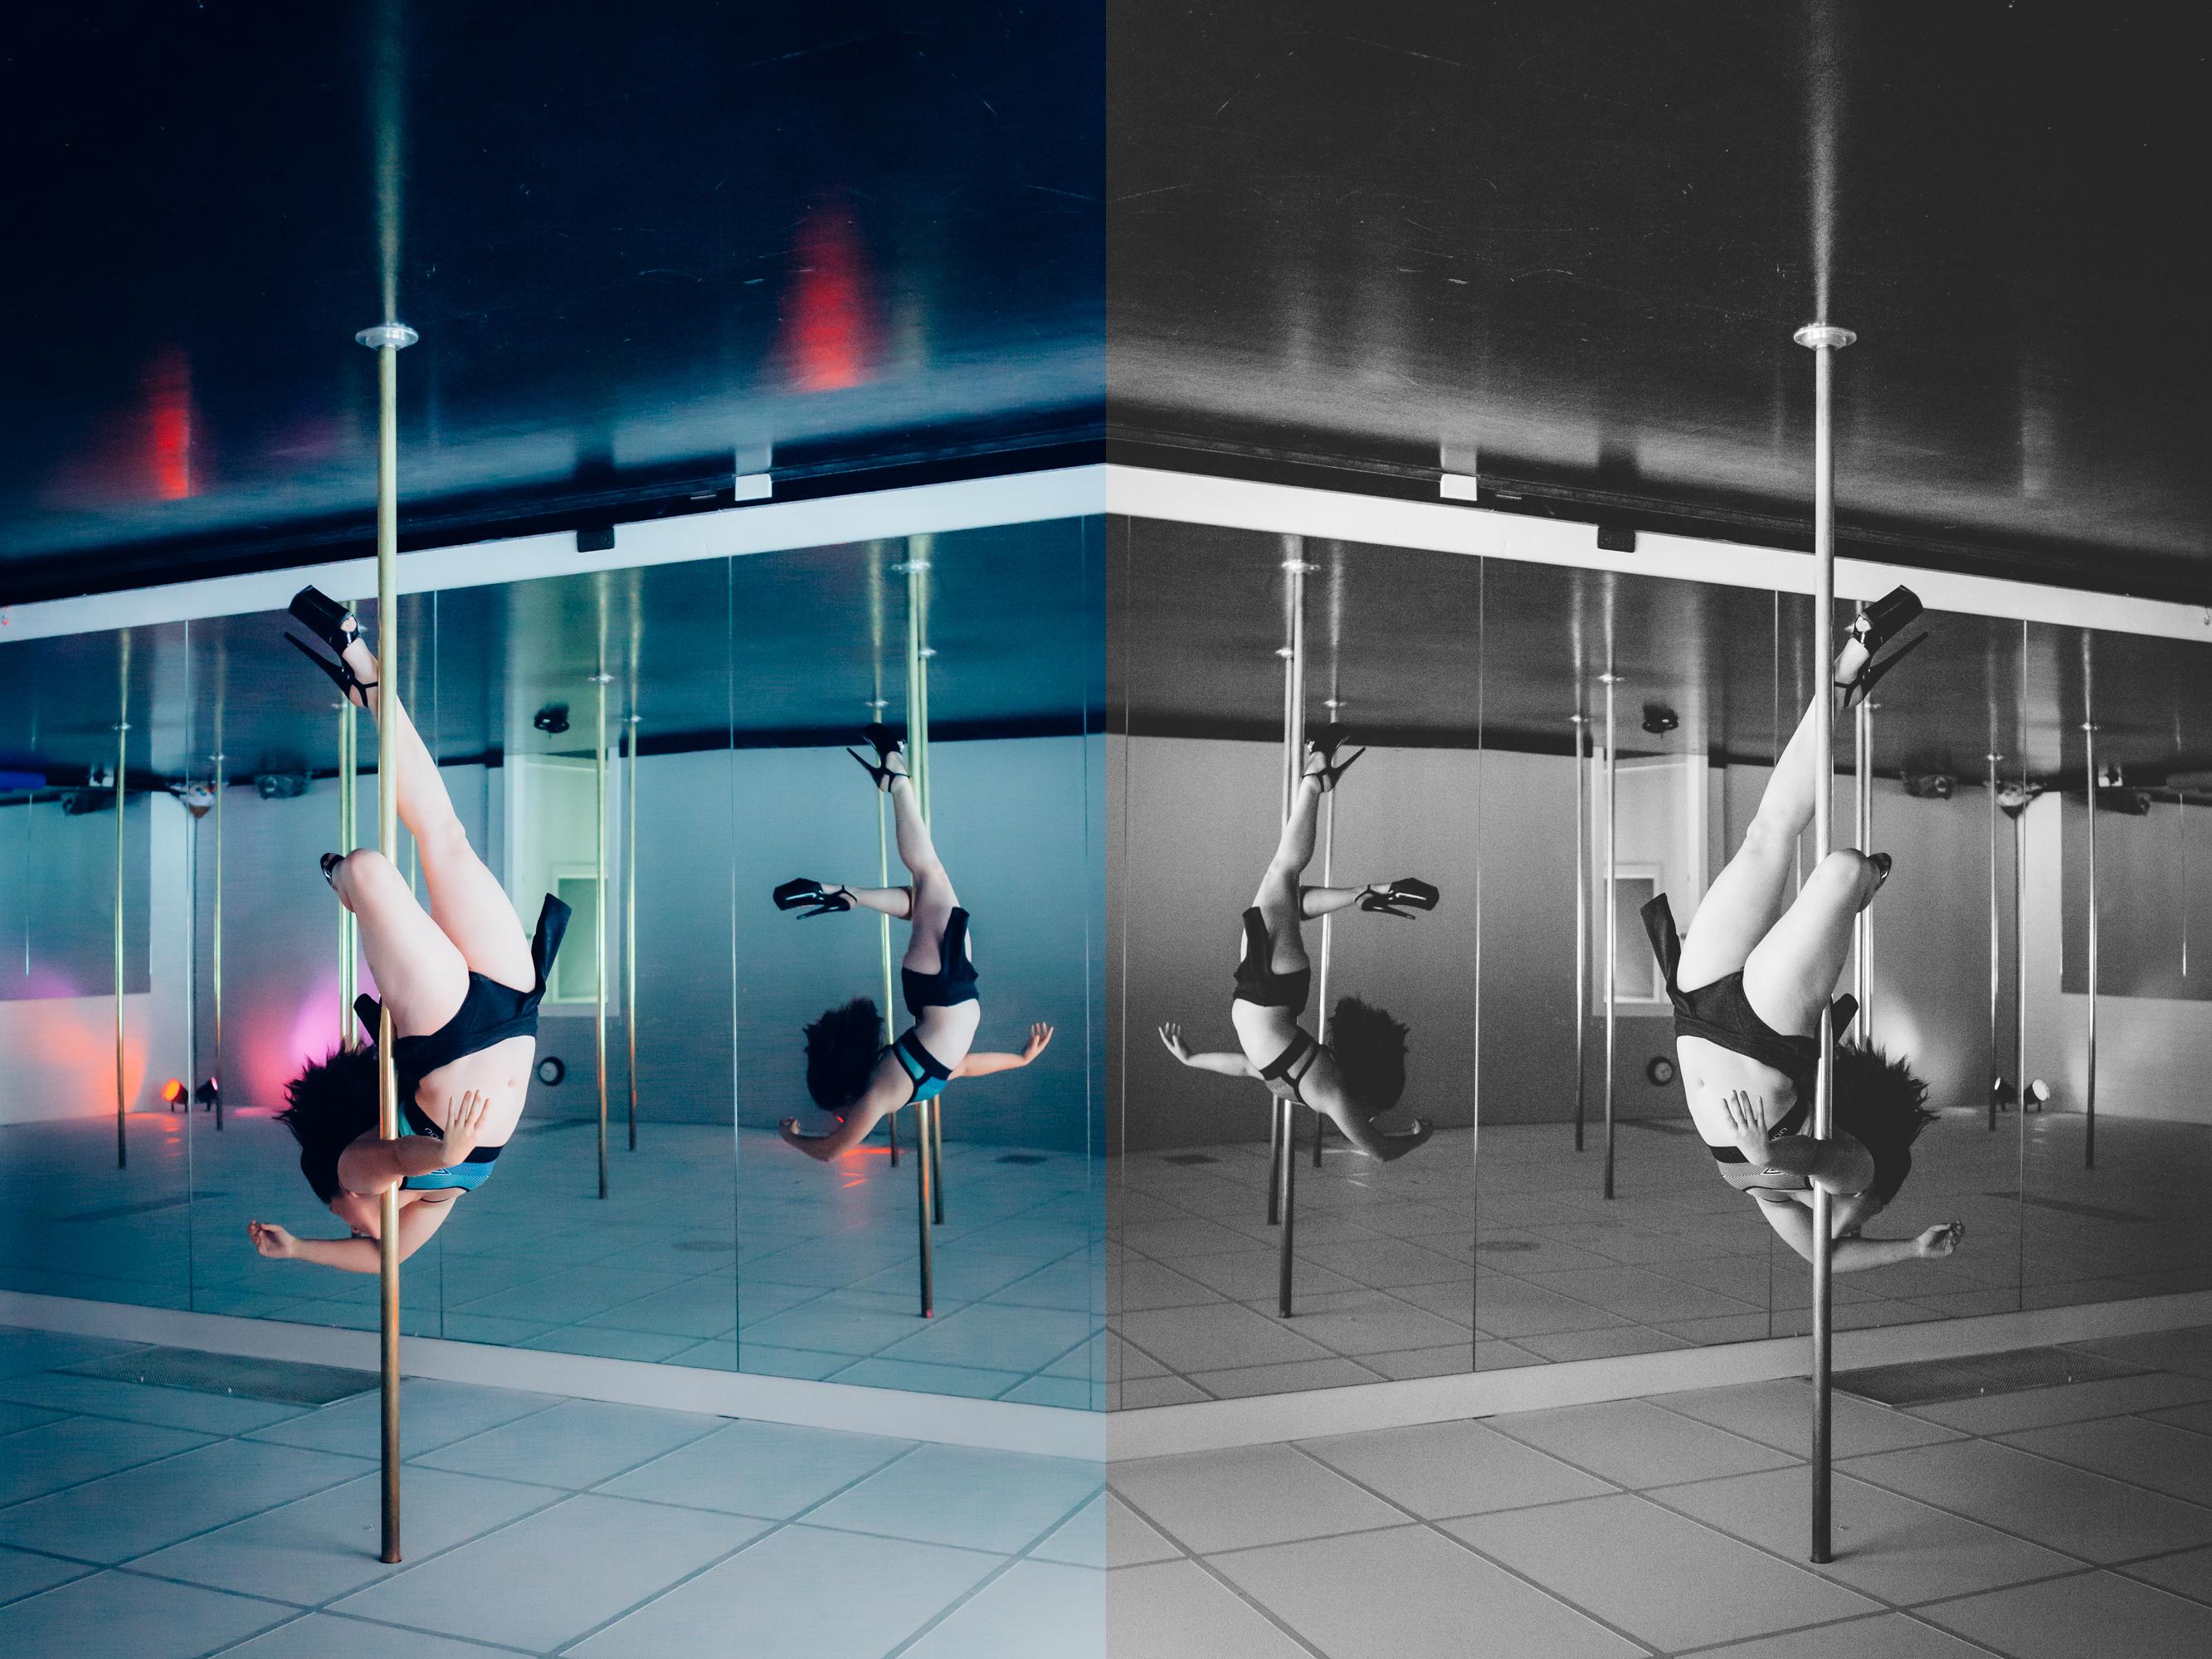 Dance/Aerial Art